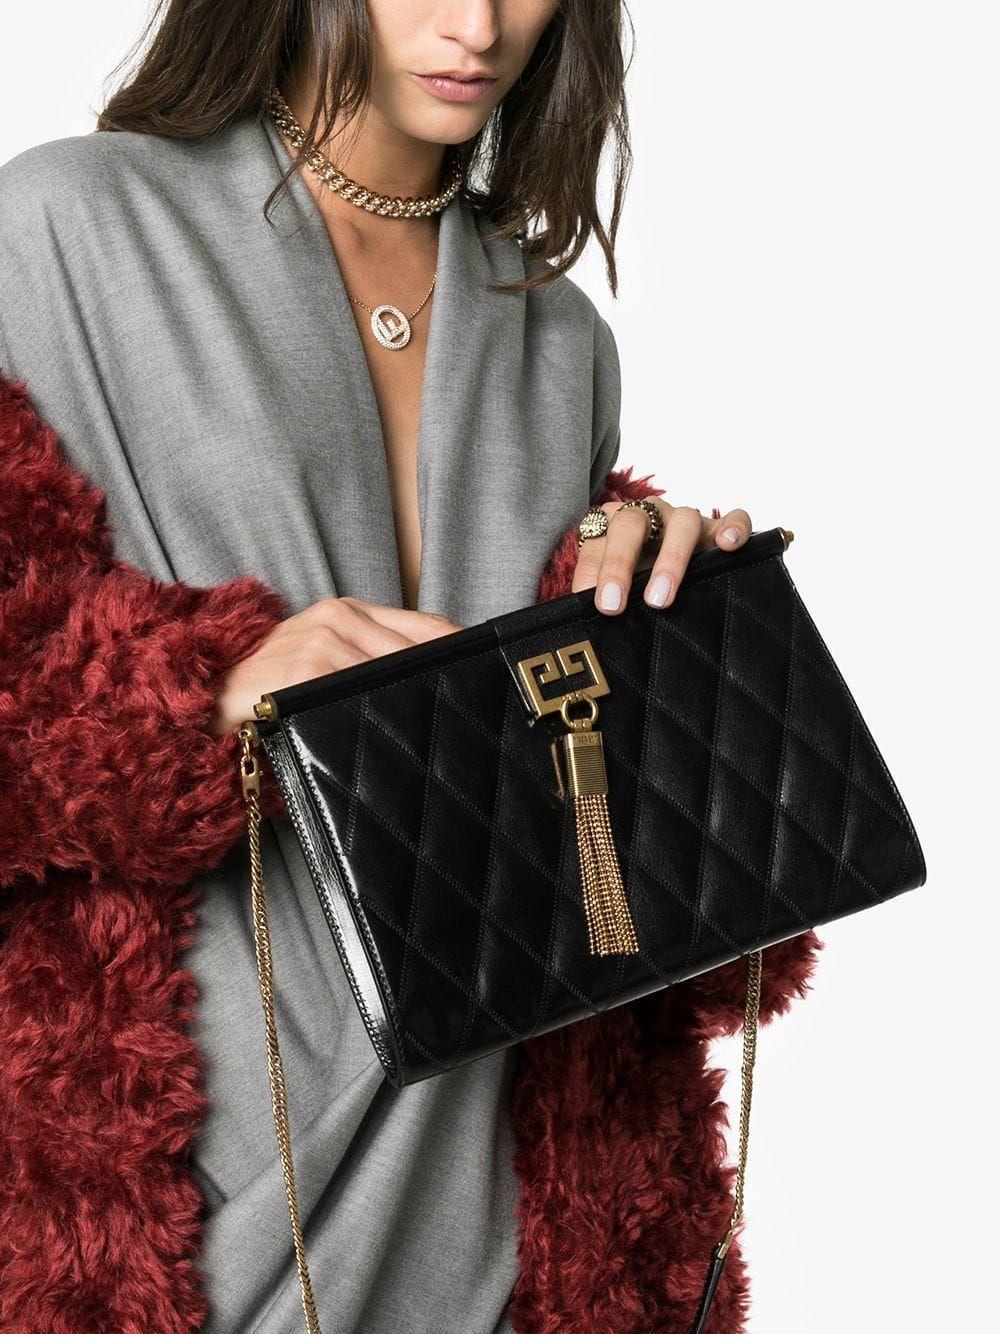 5158277e1b  givenchy  bags  gem  clutch  black  gold  chain  woman